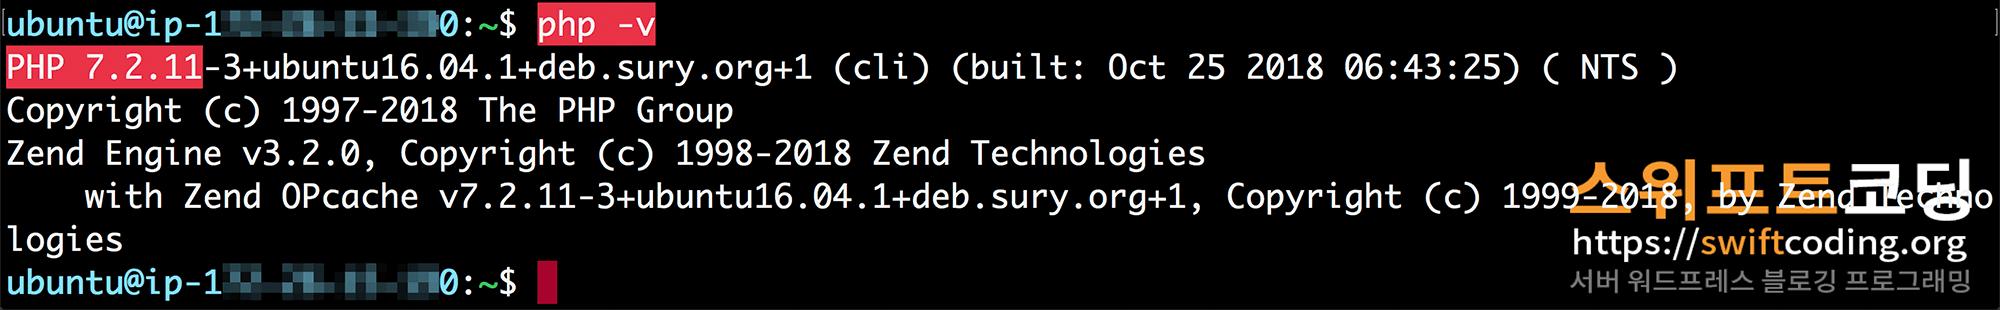 PHP 7.2.11-3+ubuntu16.04.1+deb.sury.org+1